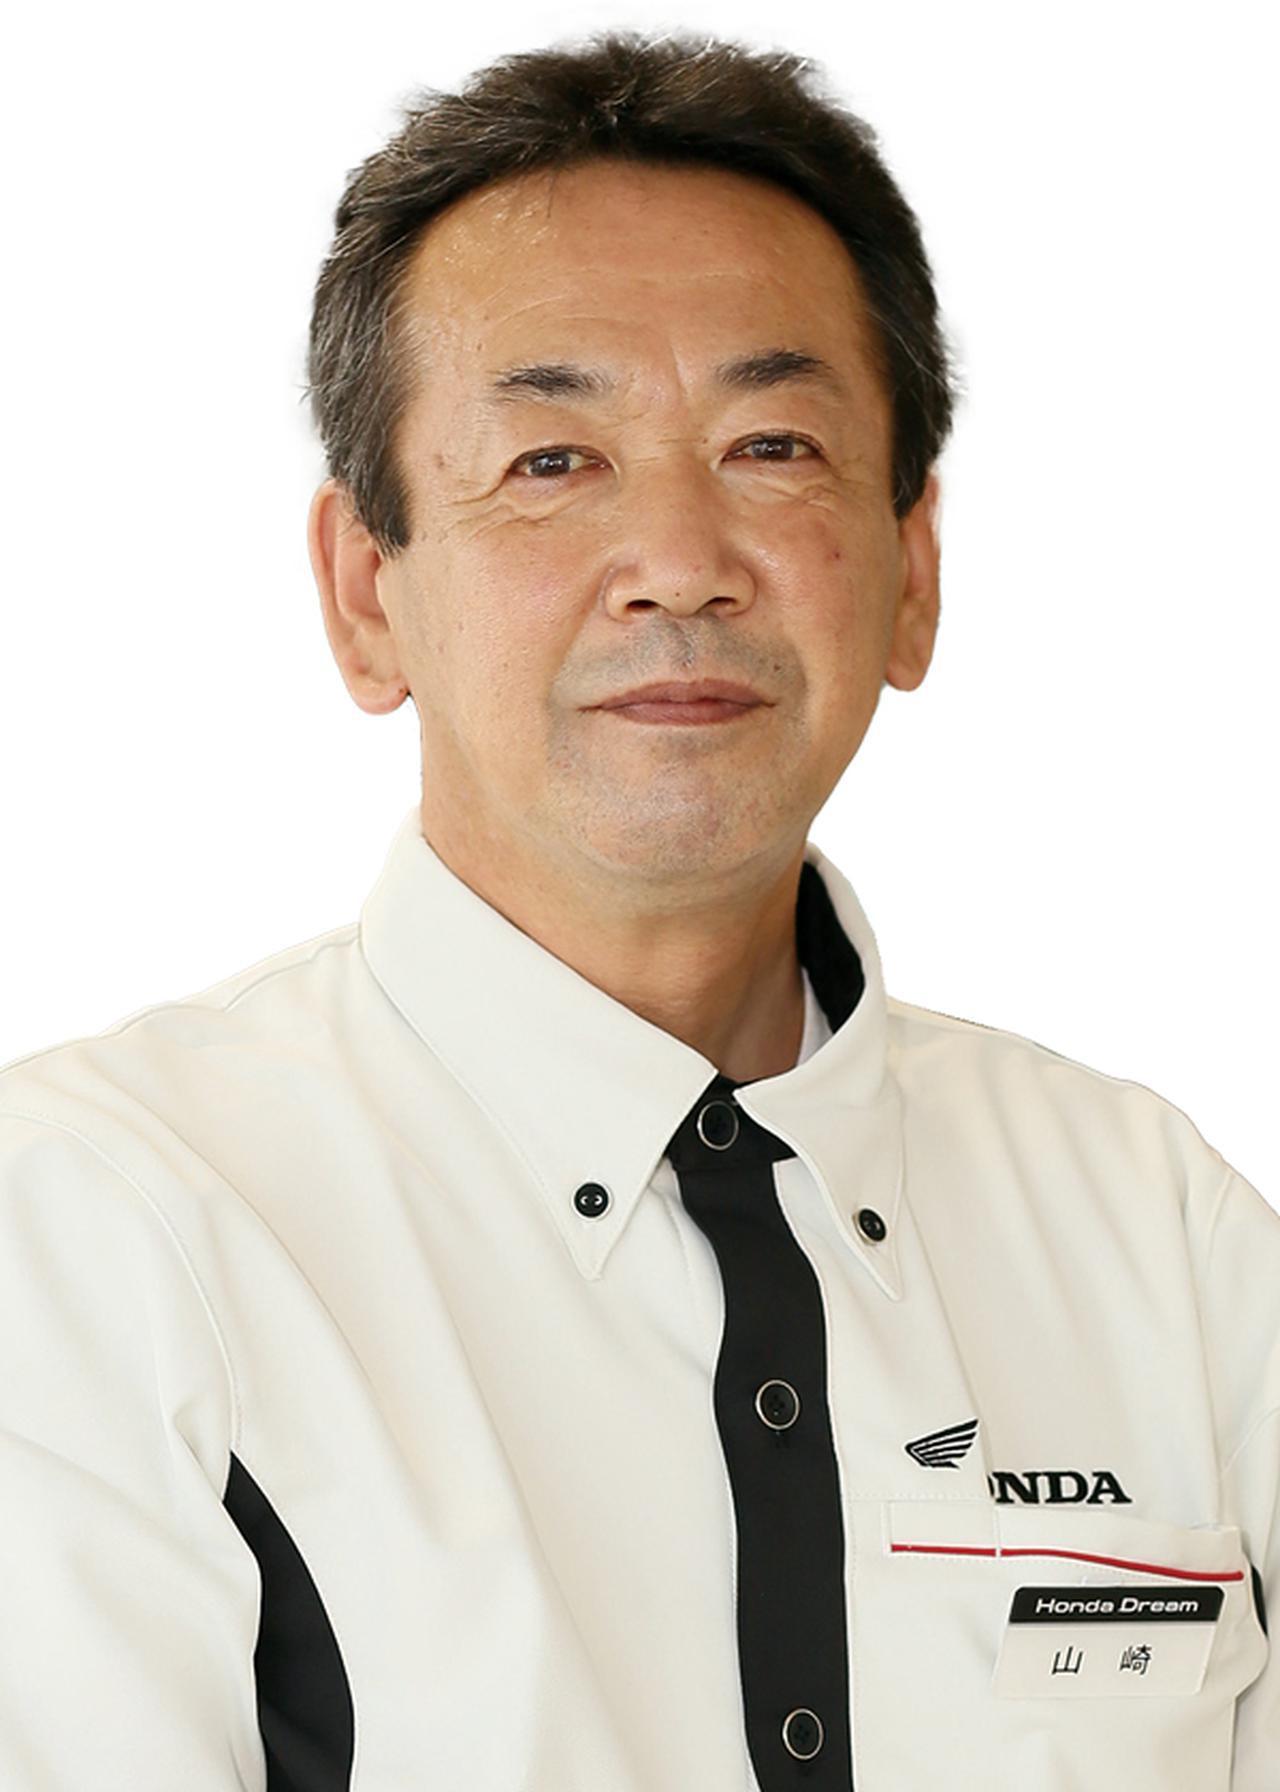 画像: Honda Dream札幌西 代表取締役 山崎和則 さん